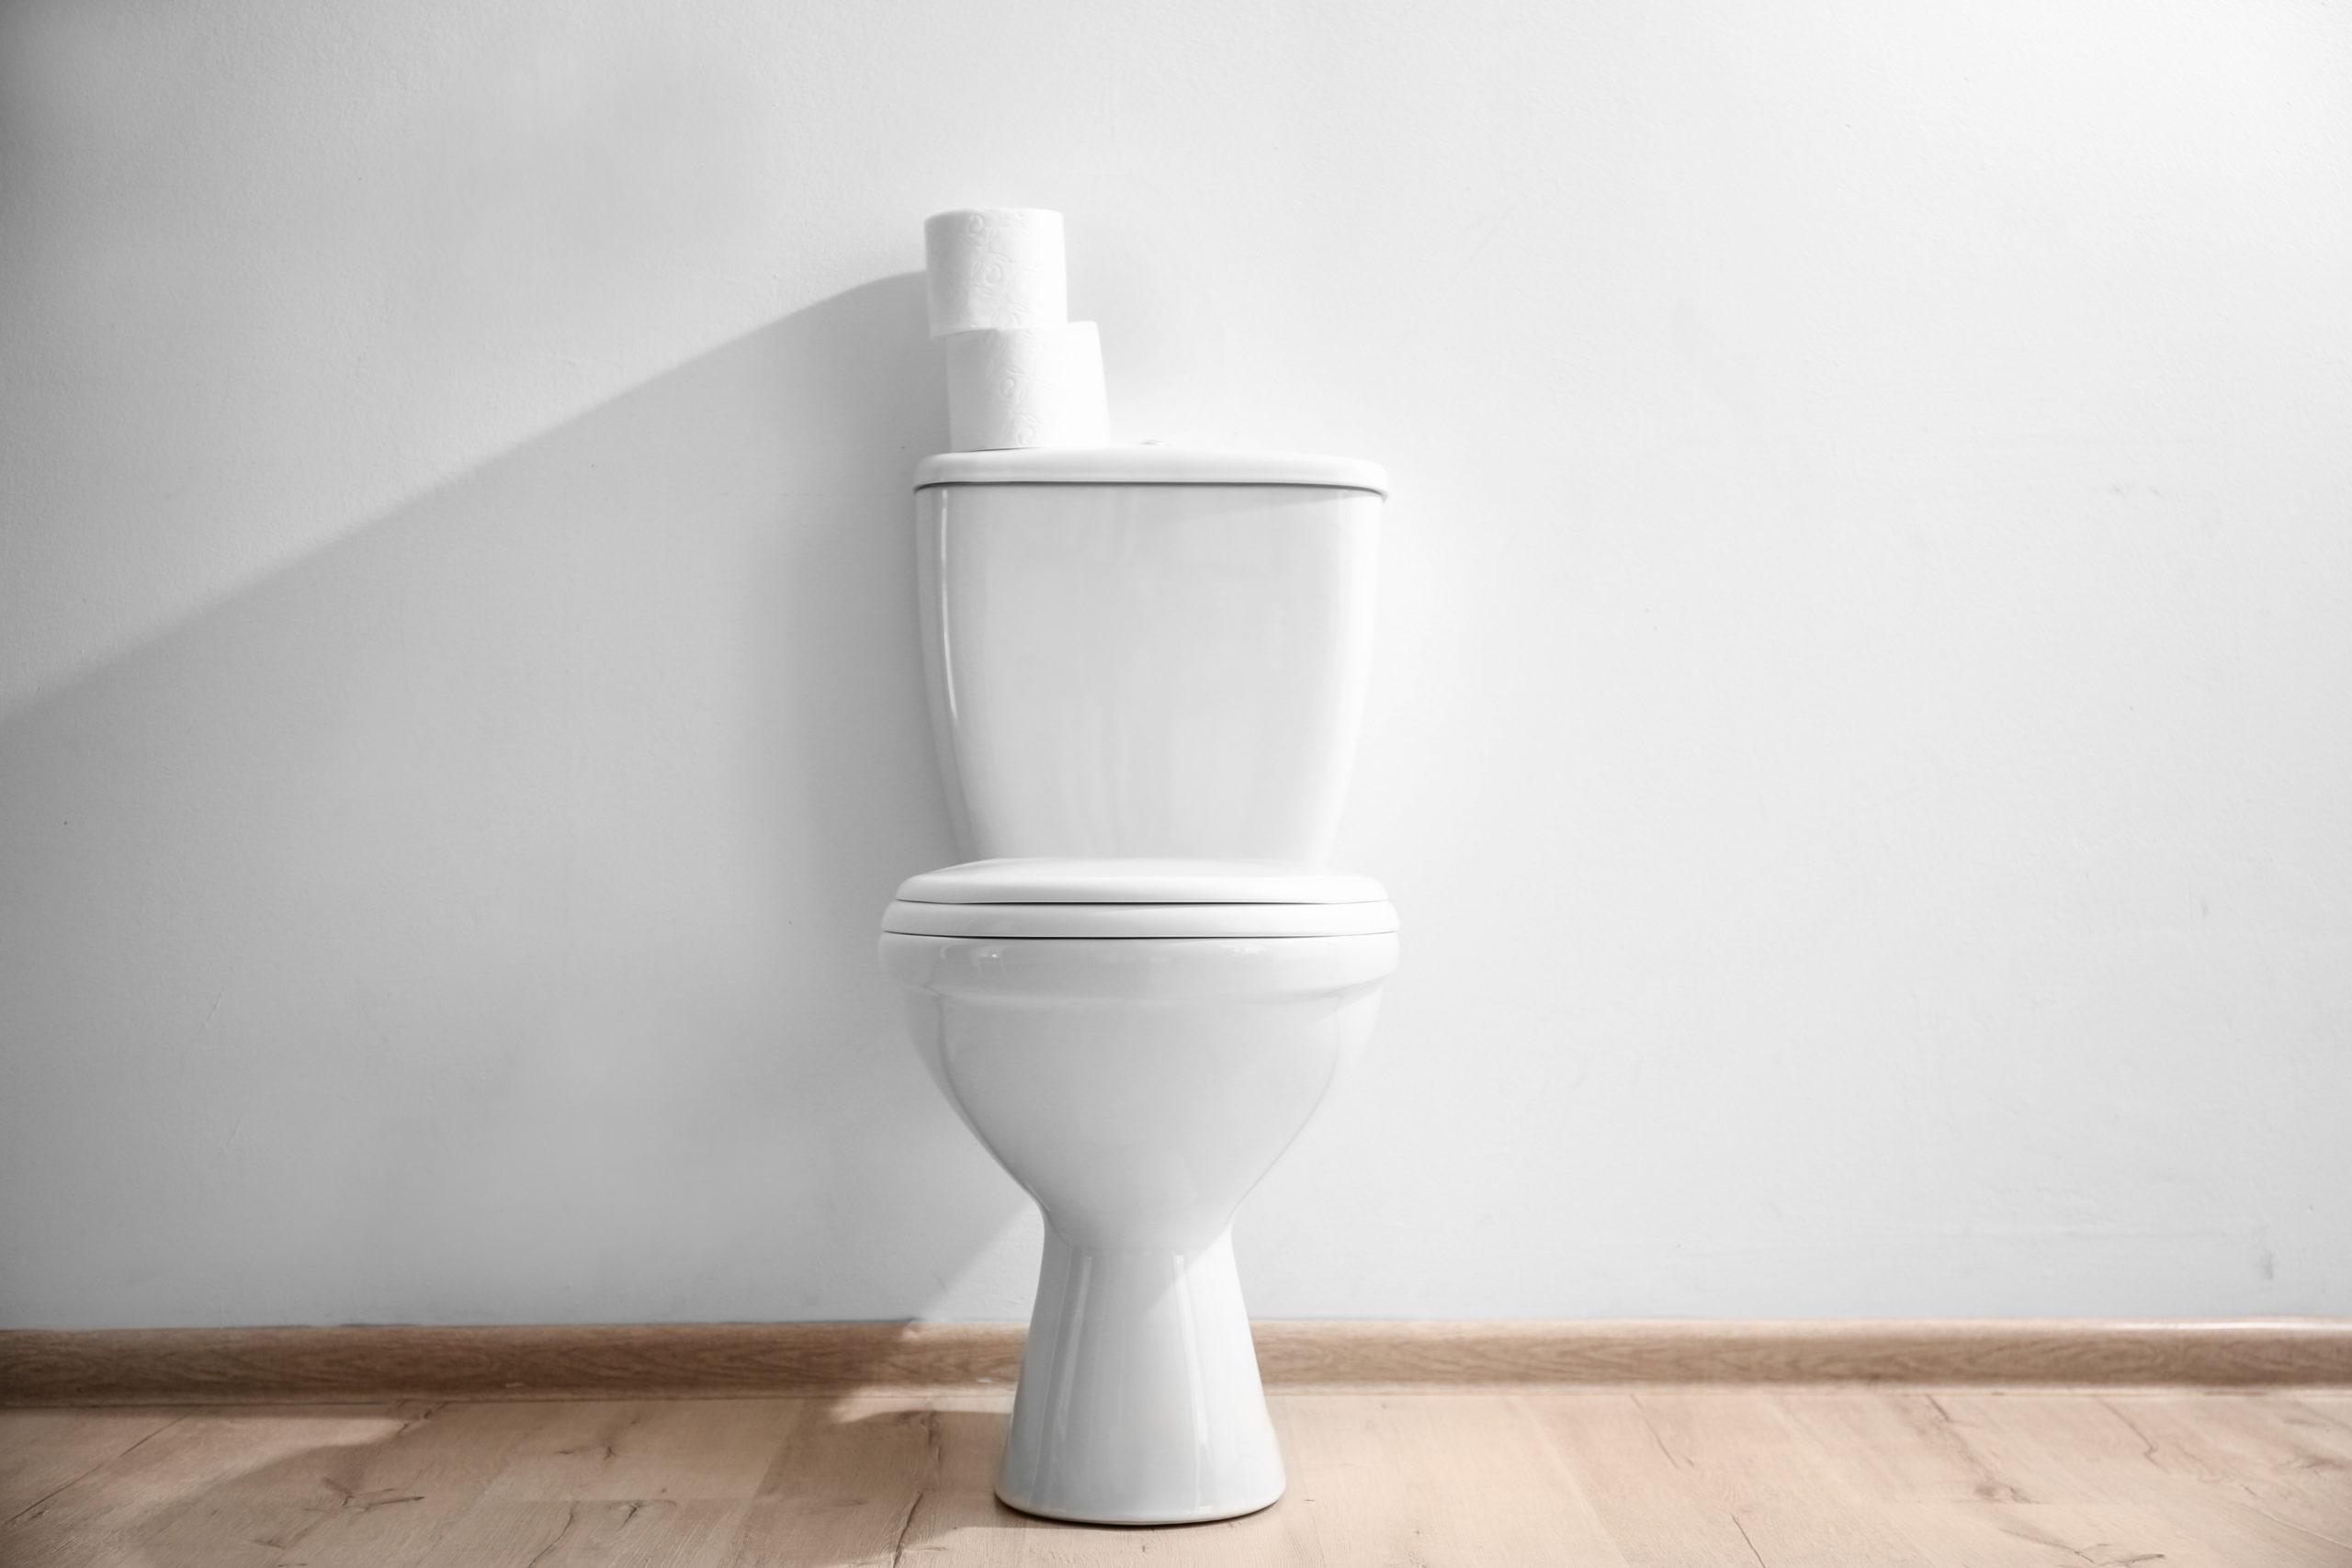 Toilet_shutterstock_New Africa